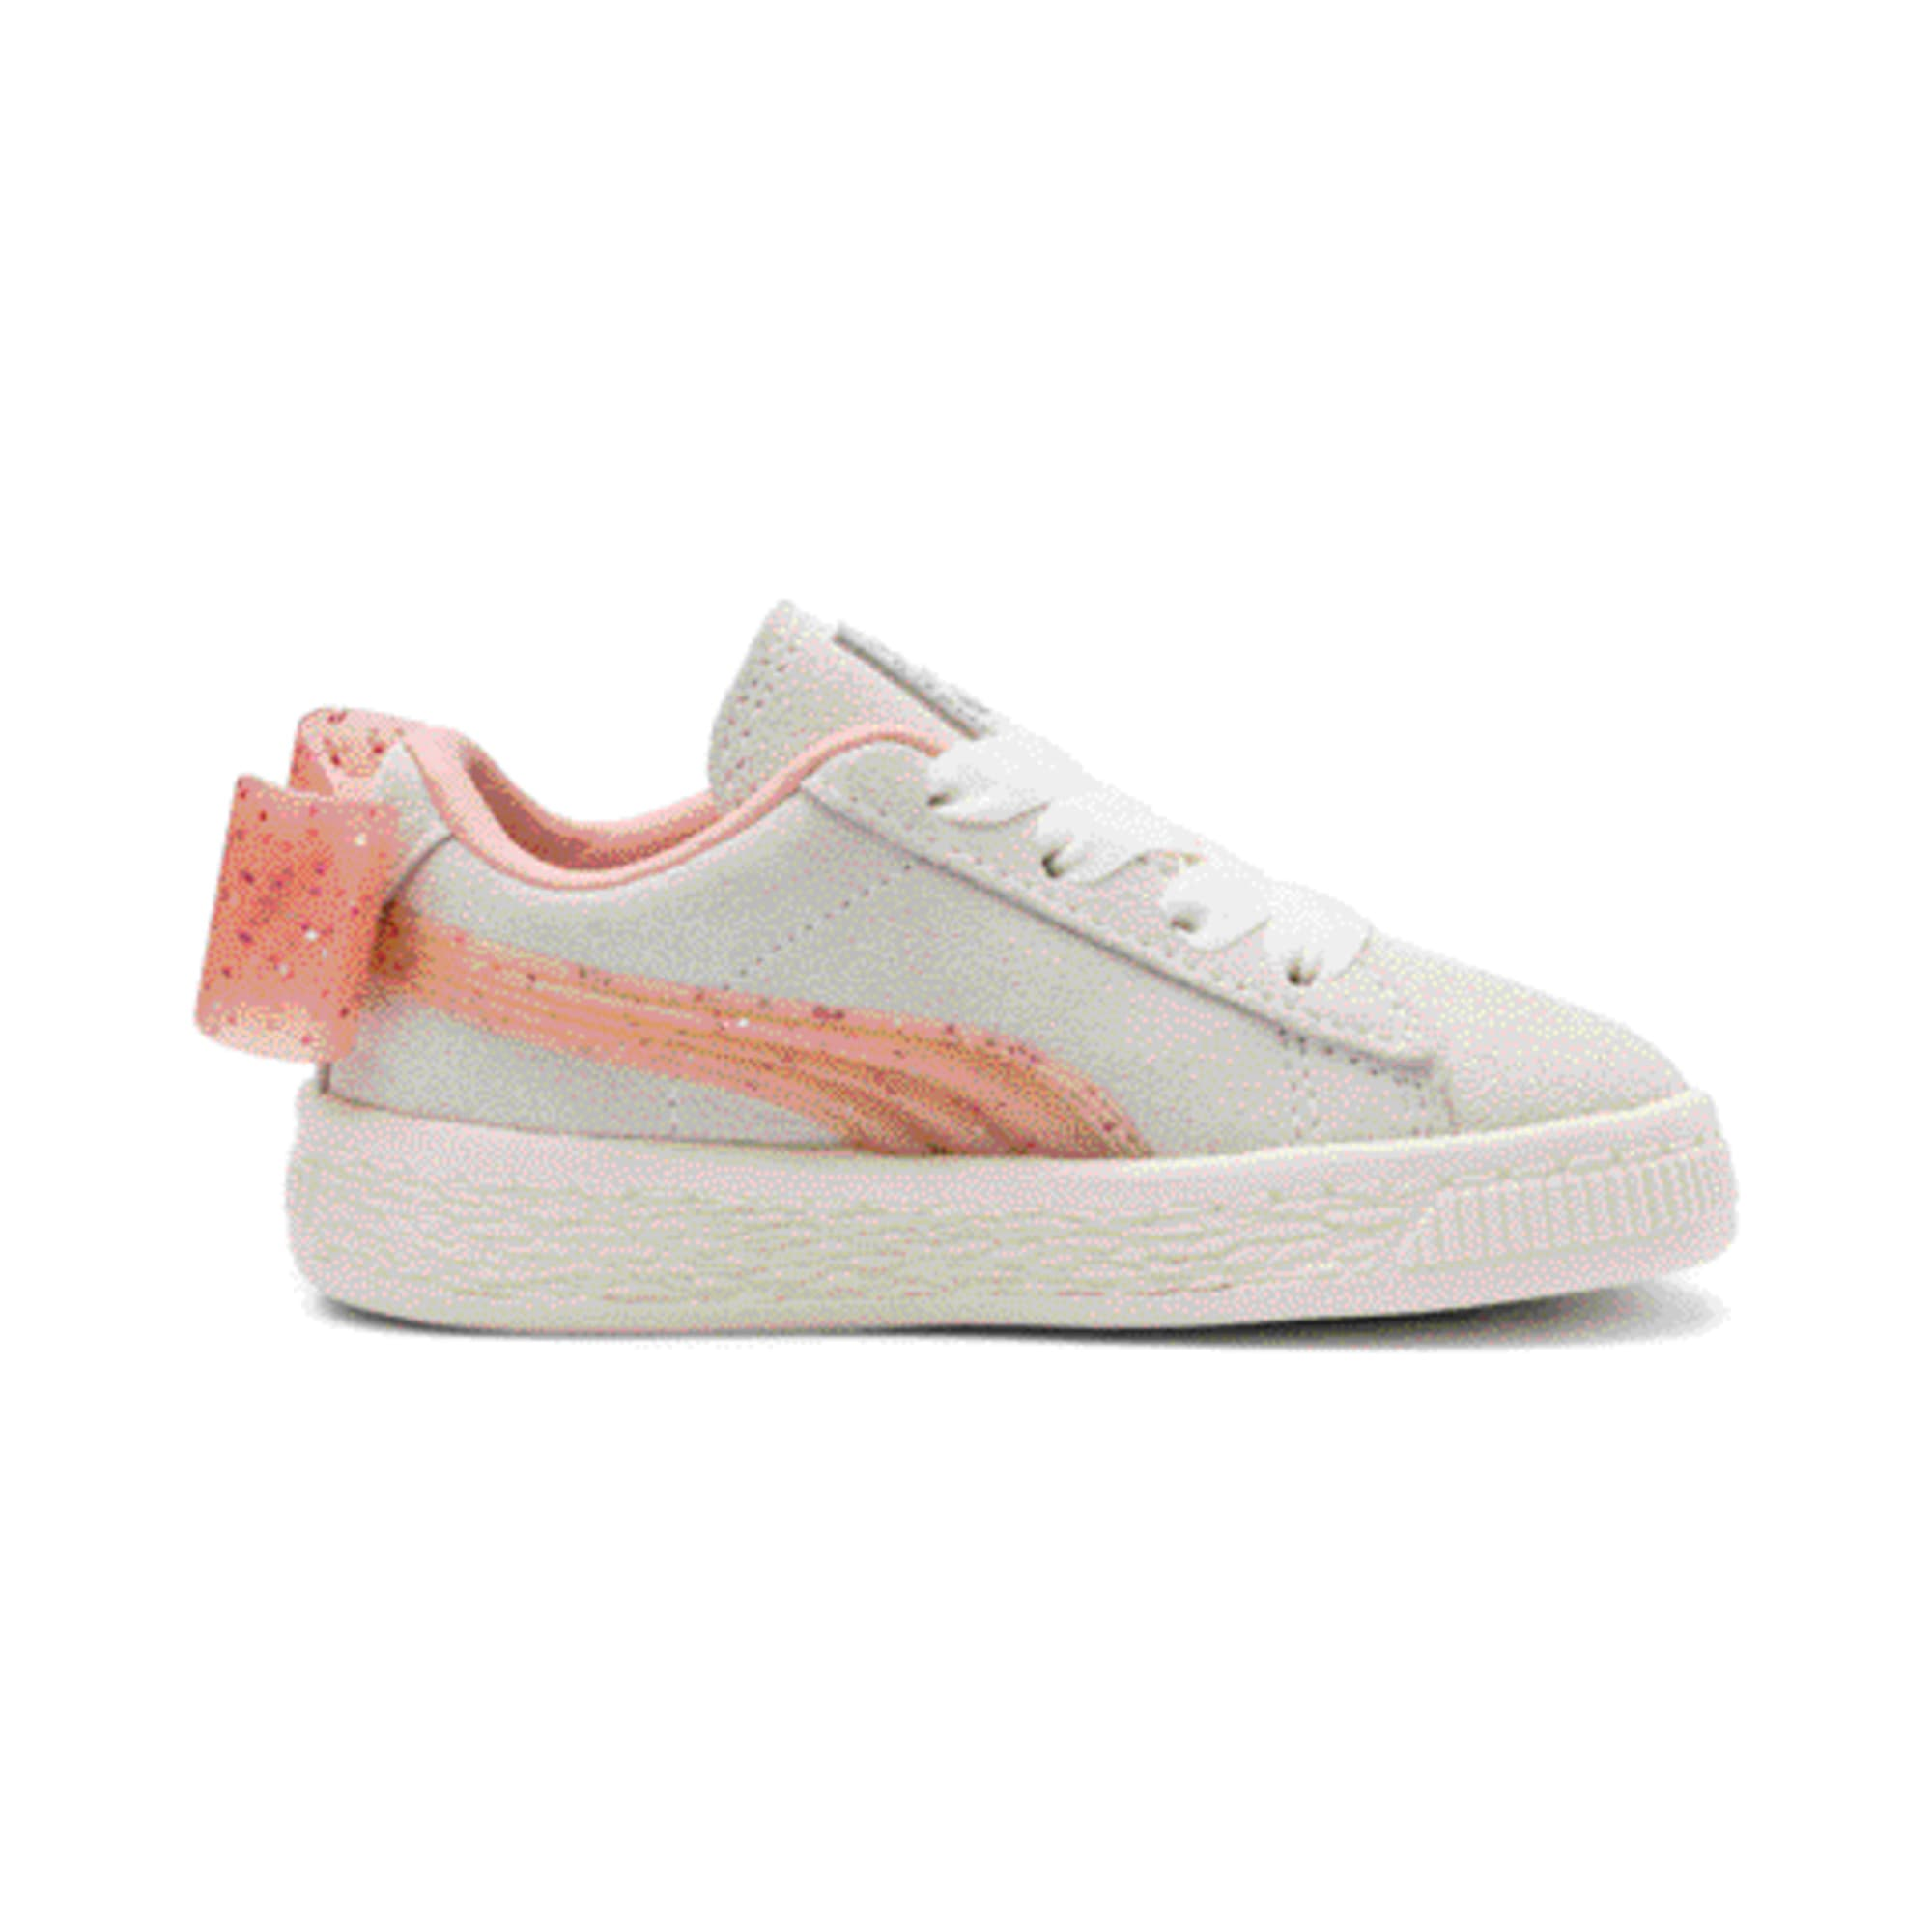 Miniatura 5 de Zapatos Suede Jelly Bow AC para bebé, White-Peach Bud-Silver, mediano